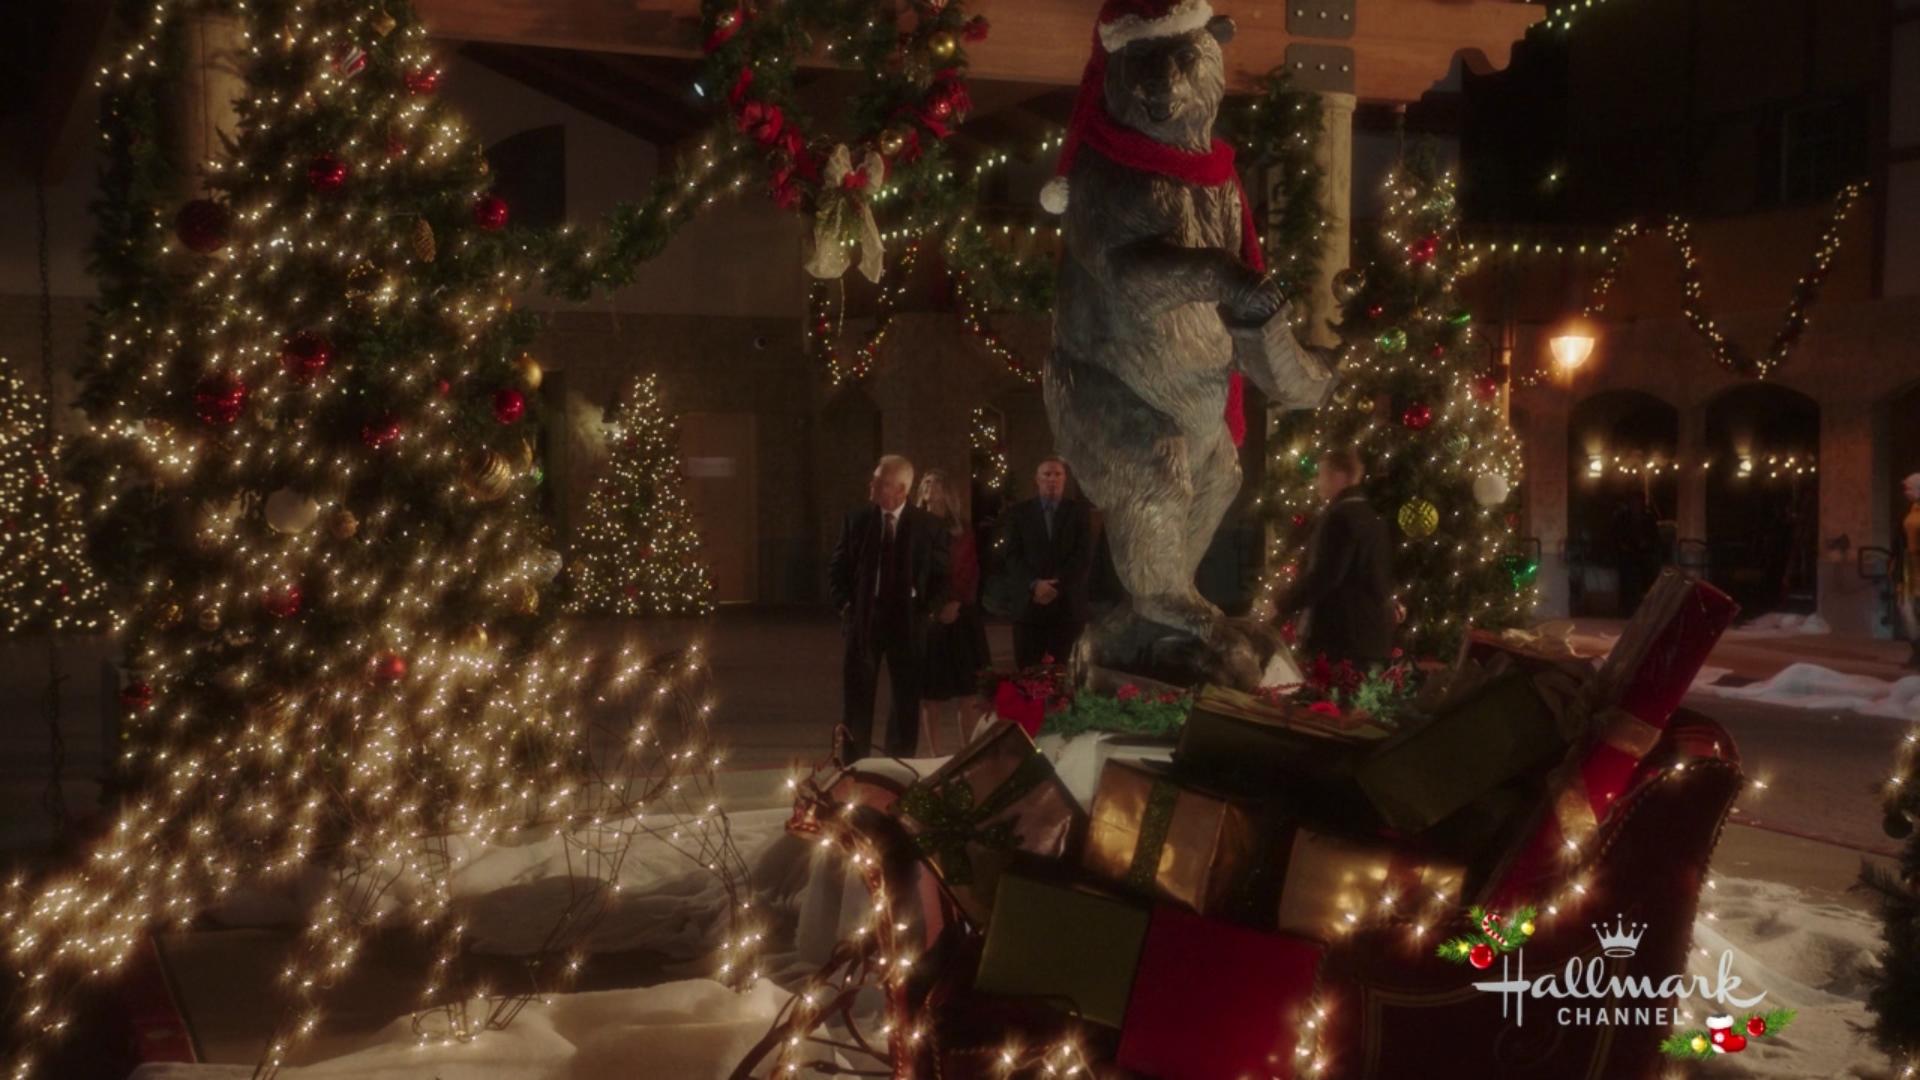 Enchanted Christmas Hallmark.Enchanted Christmas Recap Review The Hallremark